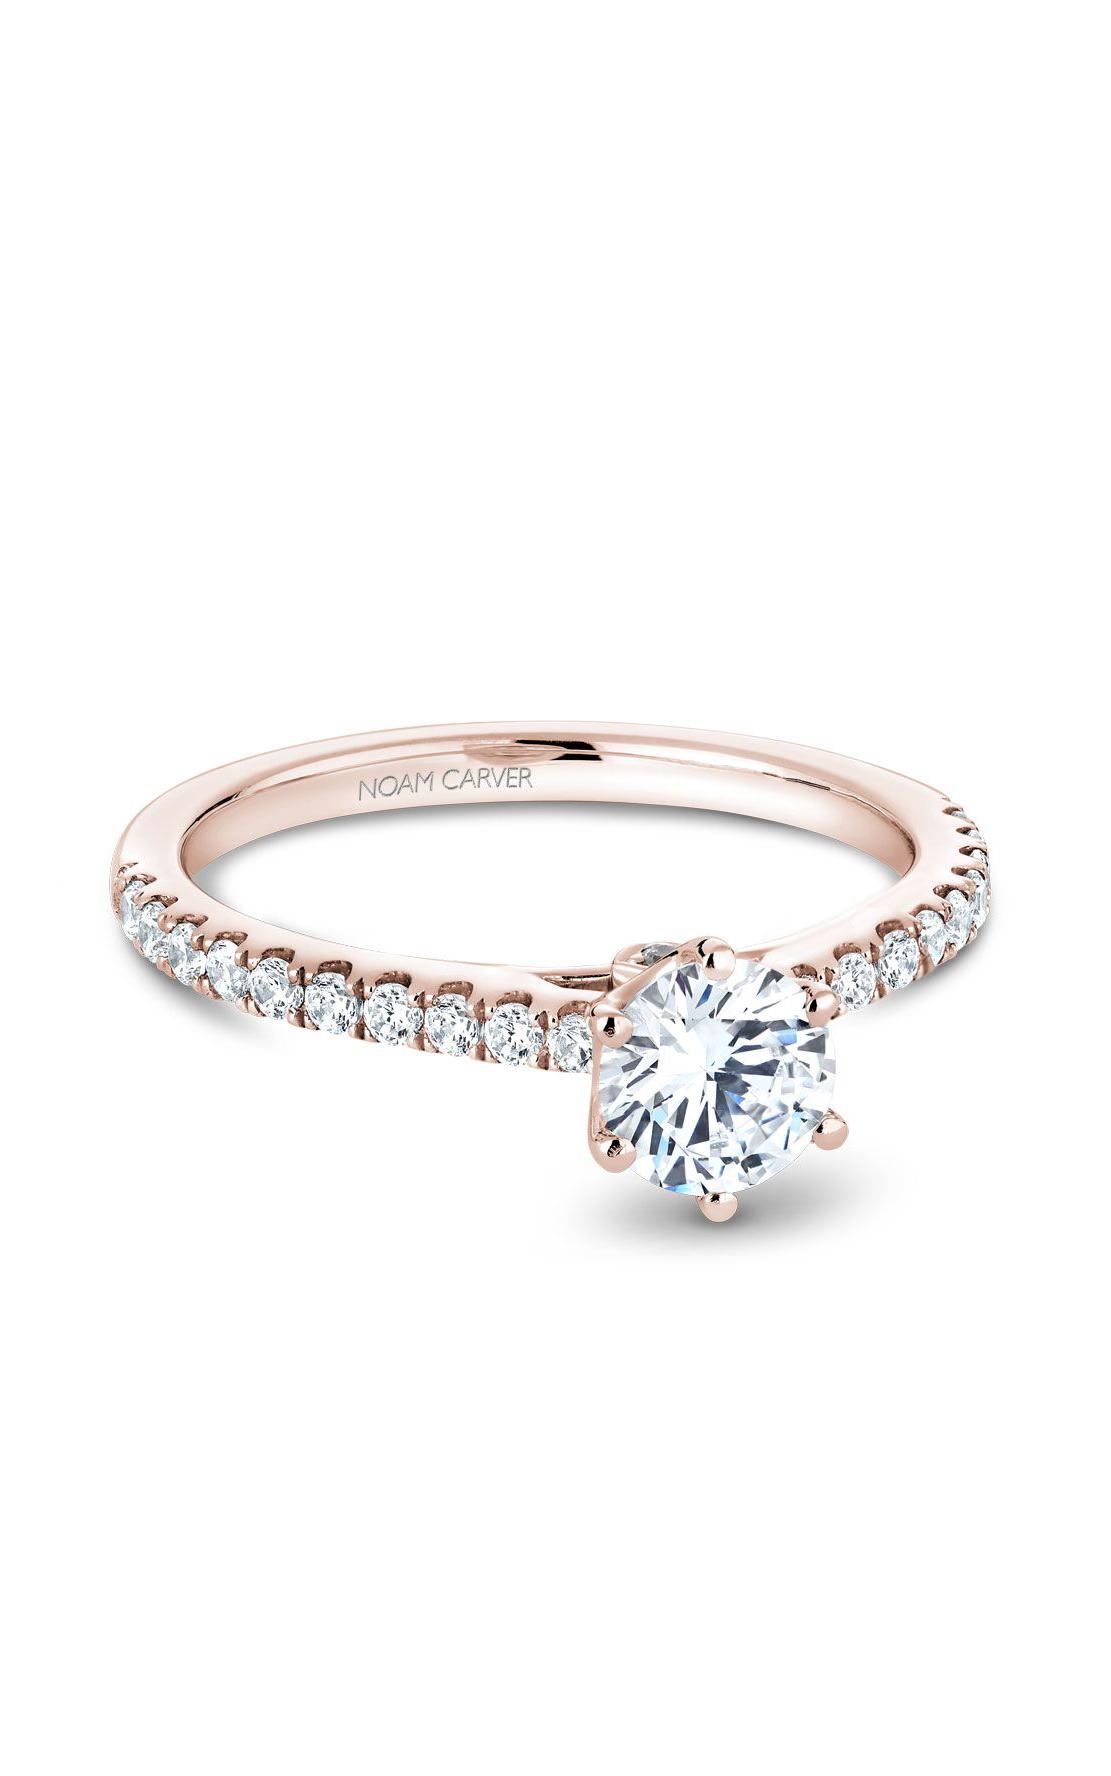 Noam Carver Classic Engagement Ring B142-17RA product image